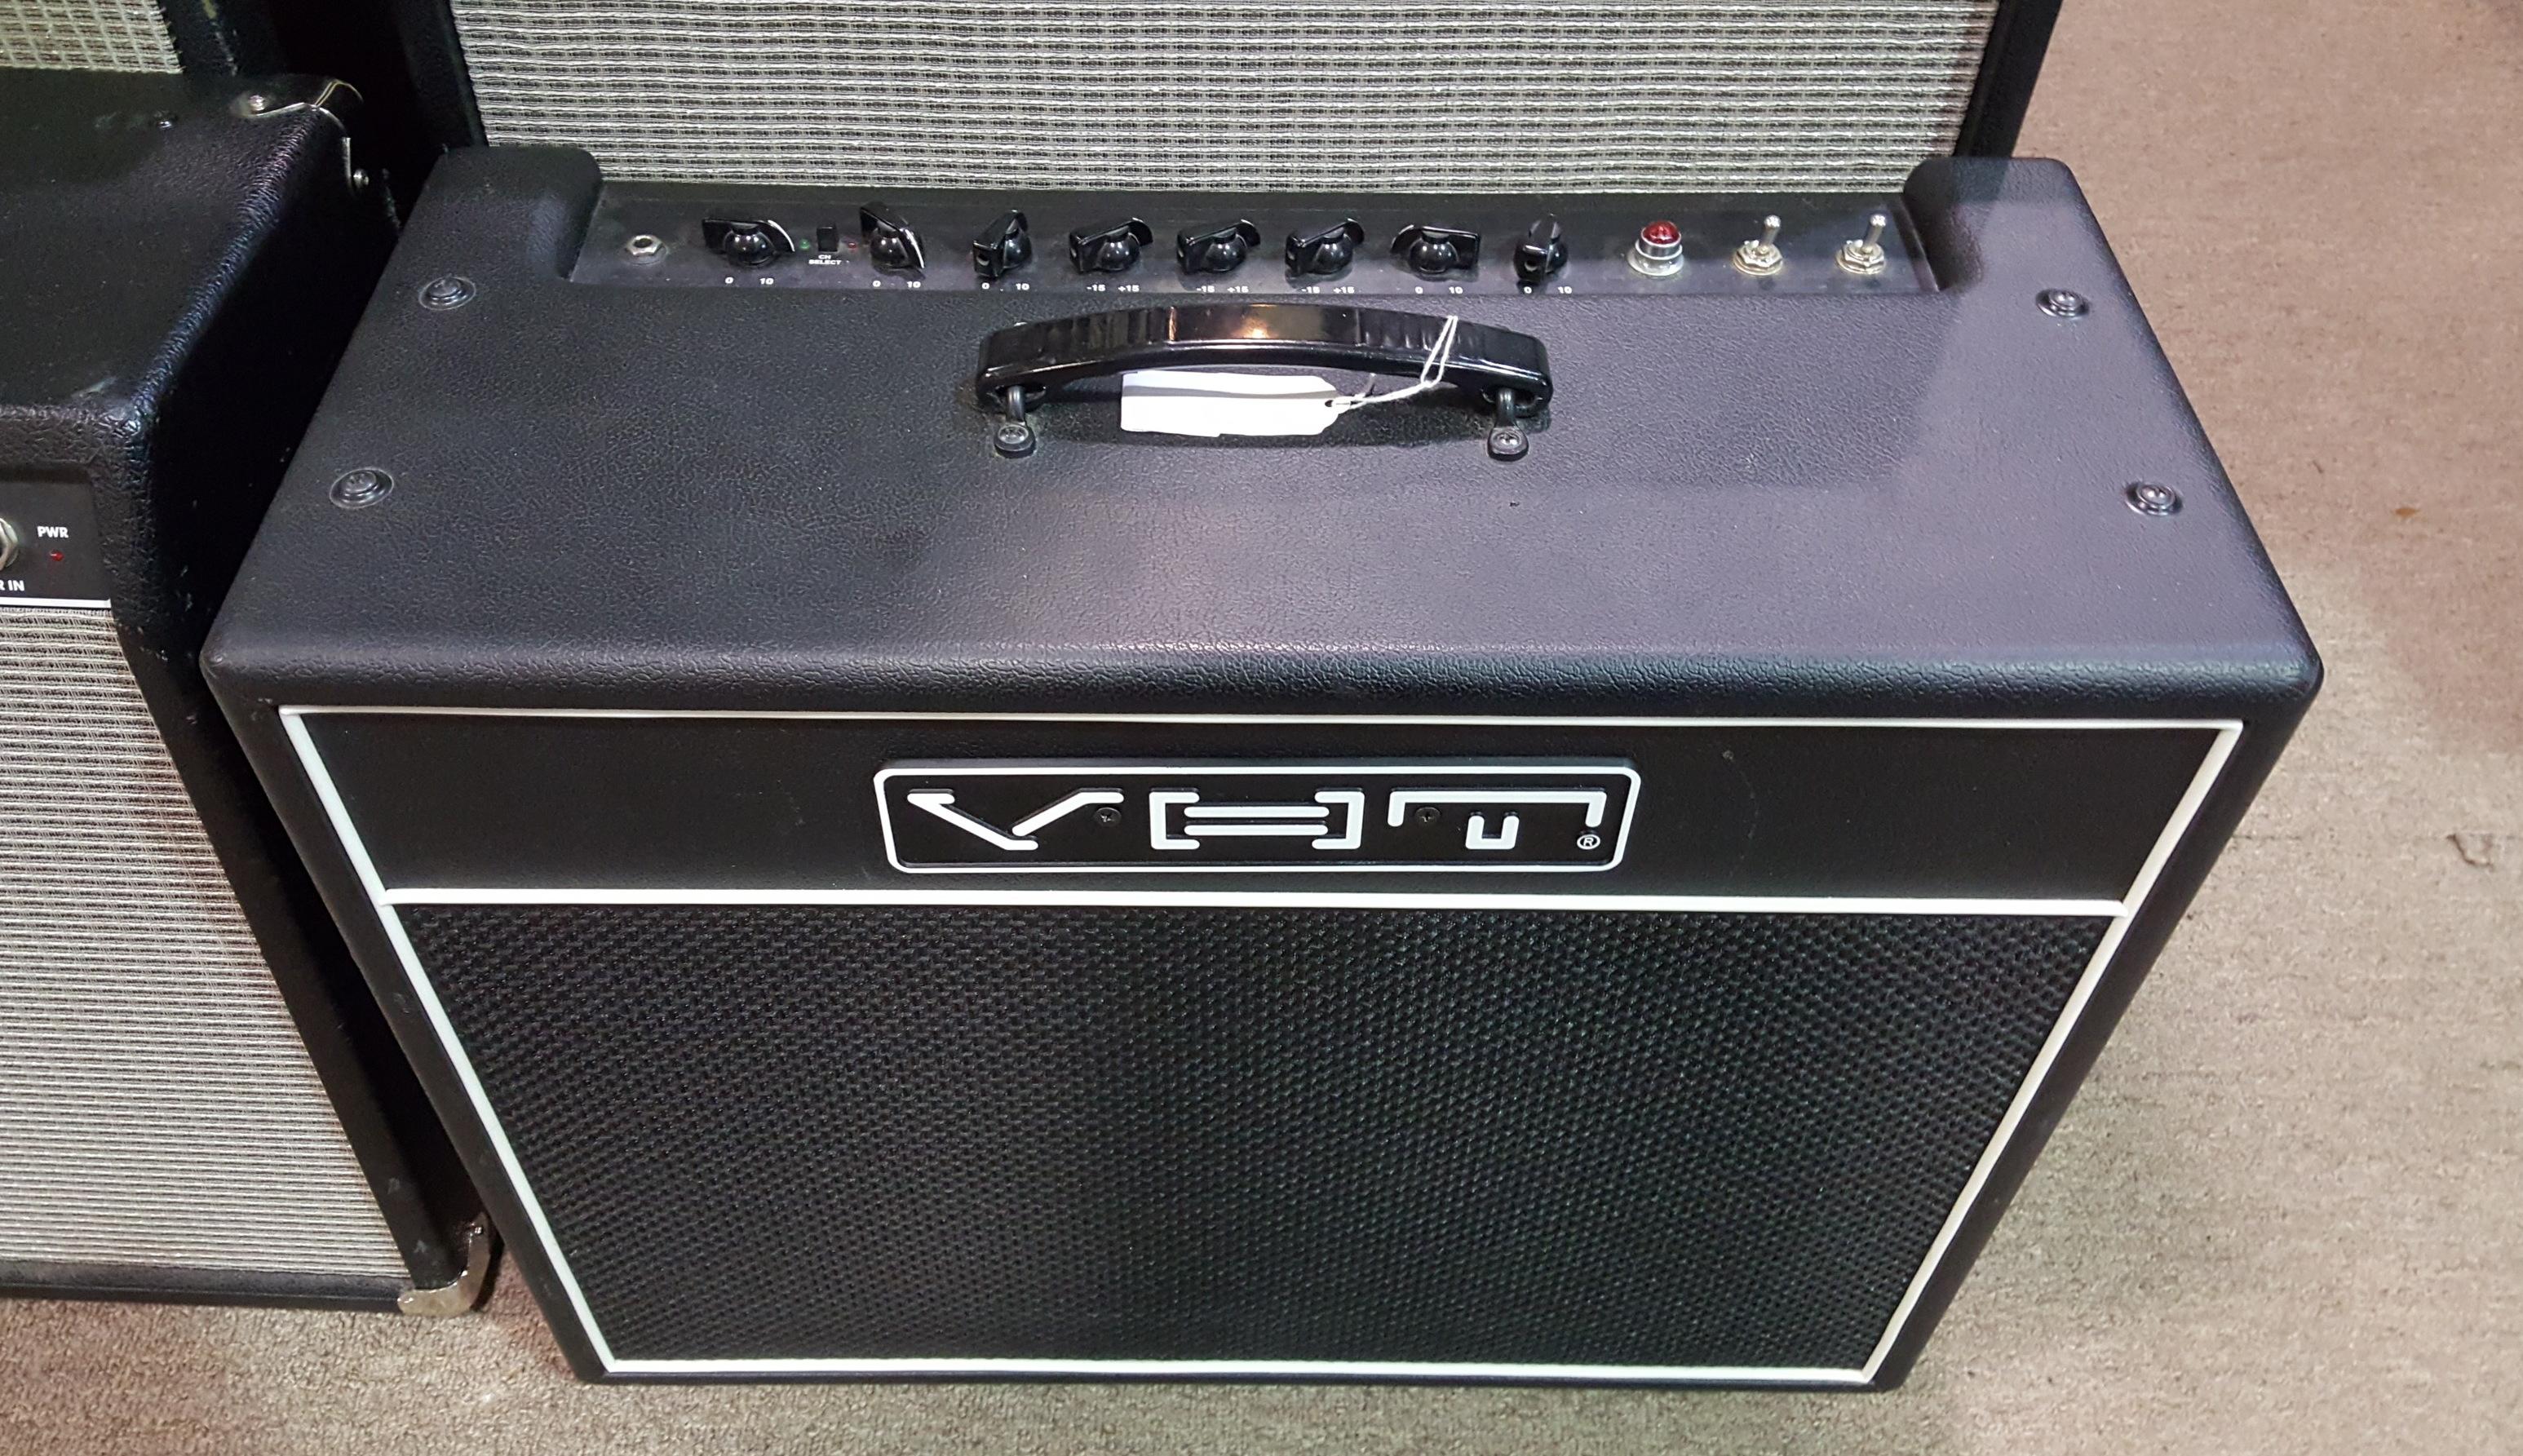 VHT LEAD 20 20-Watt 1x12 Tube Guitar Amp Combo **PICKUP ONLY**